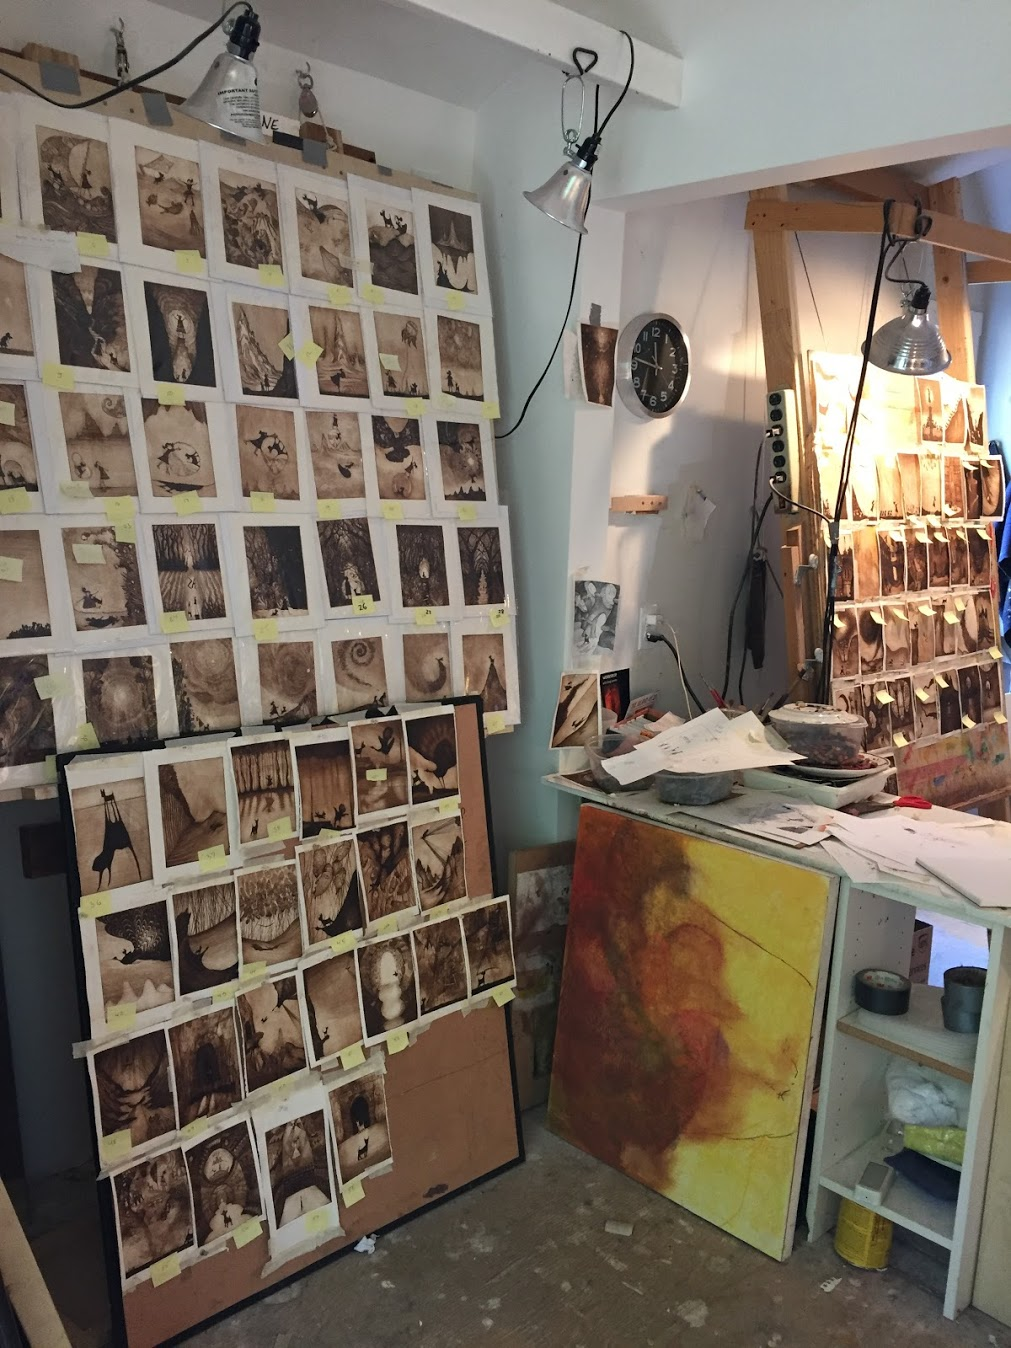 A look inside Doug's studio.